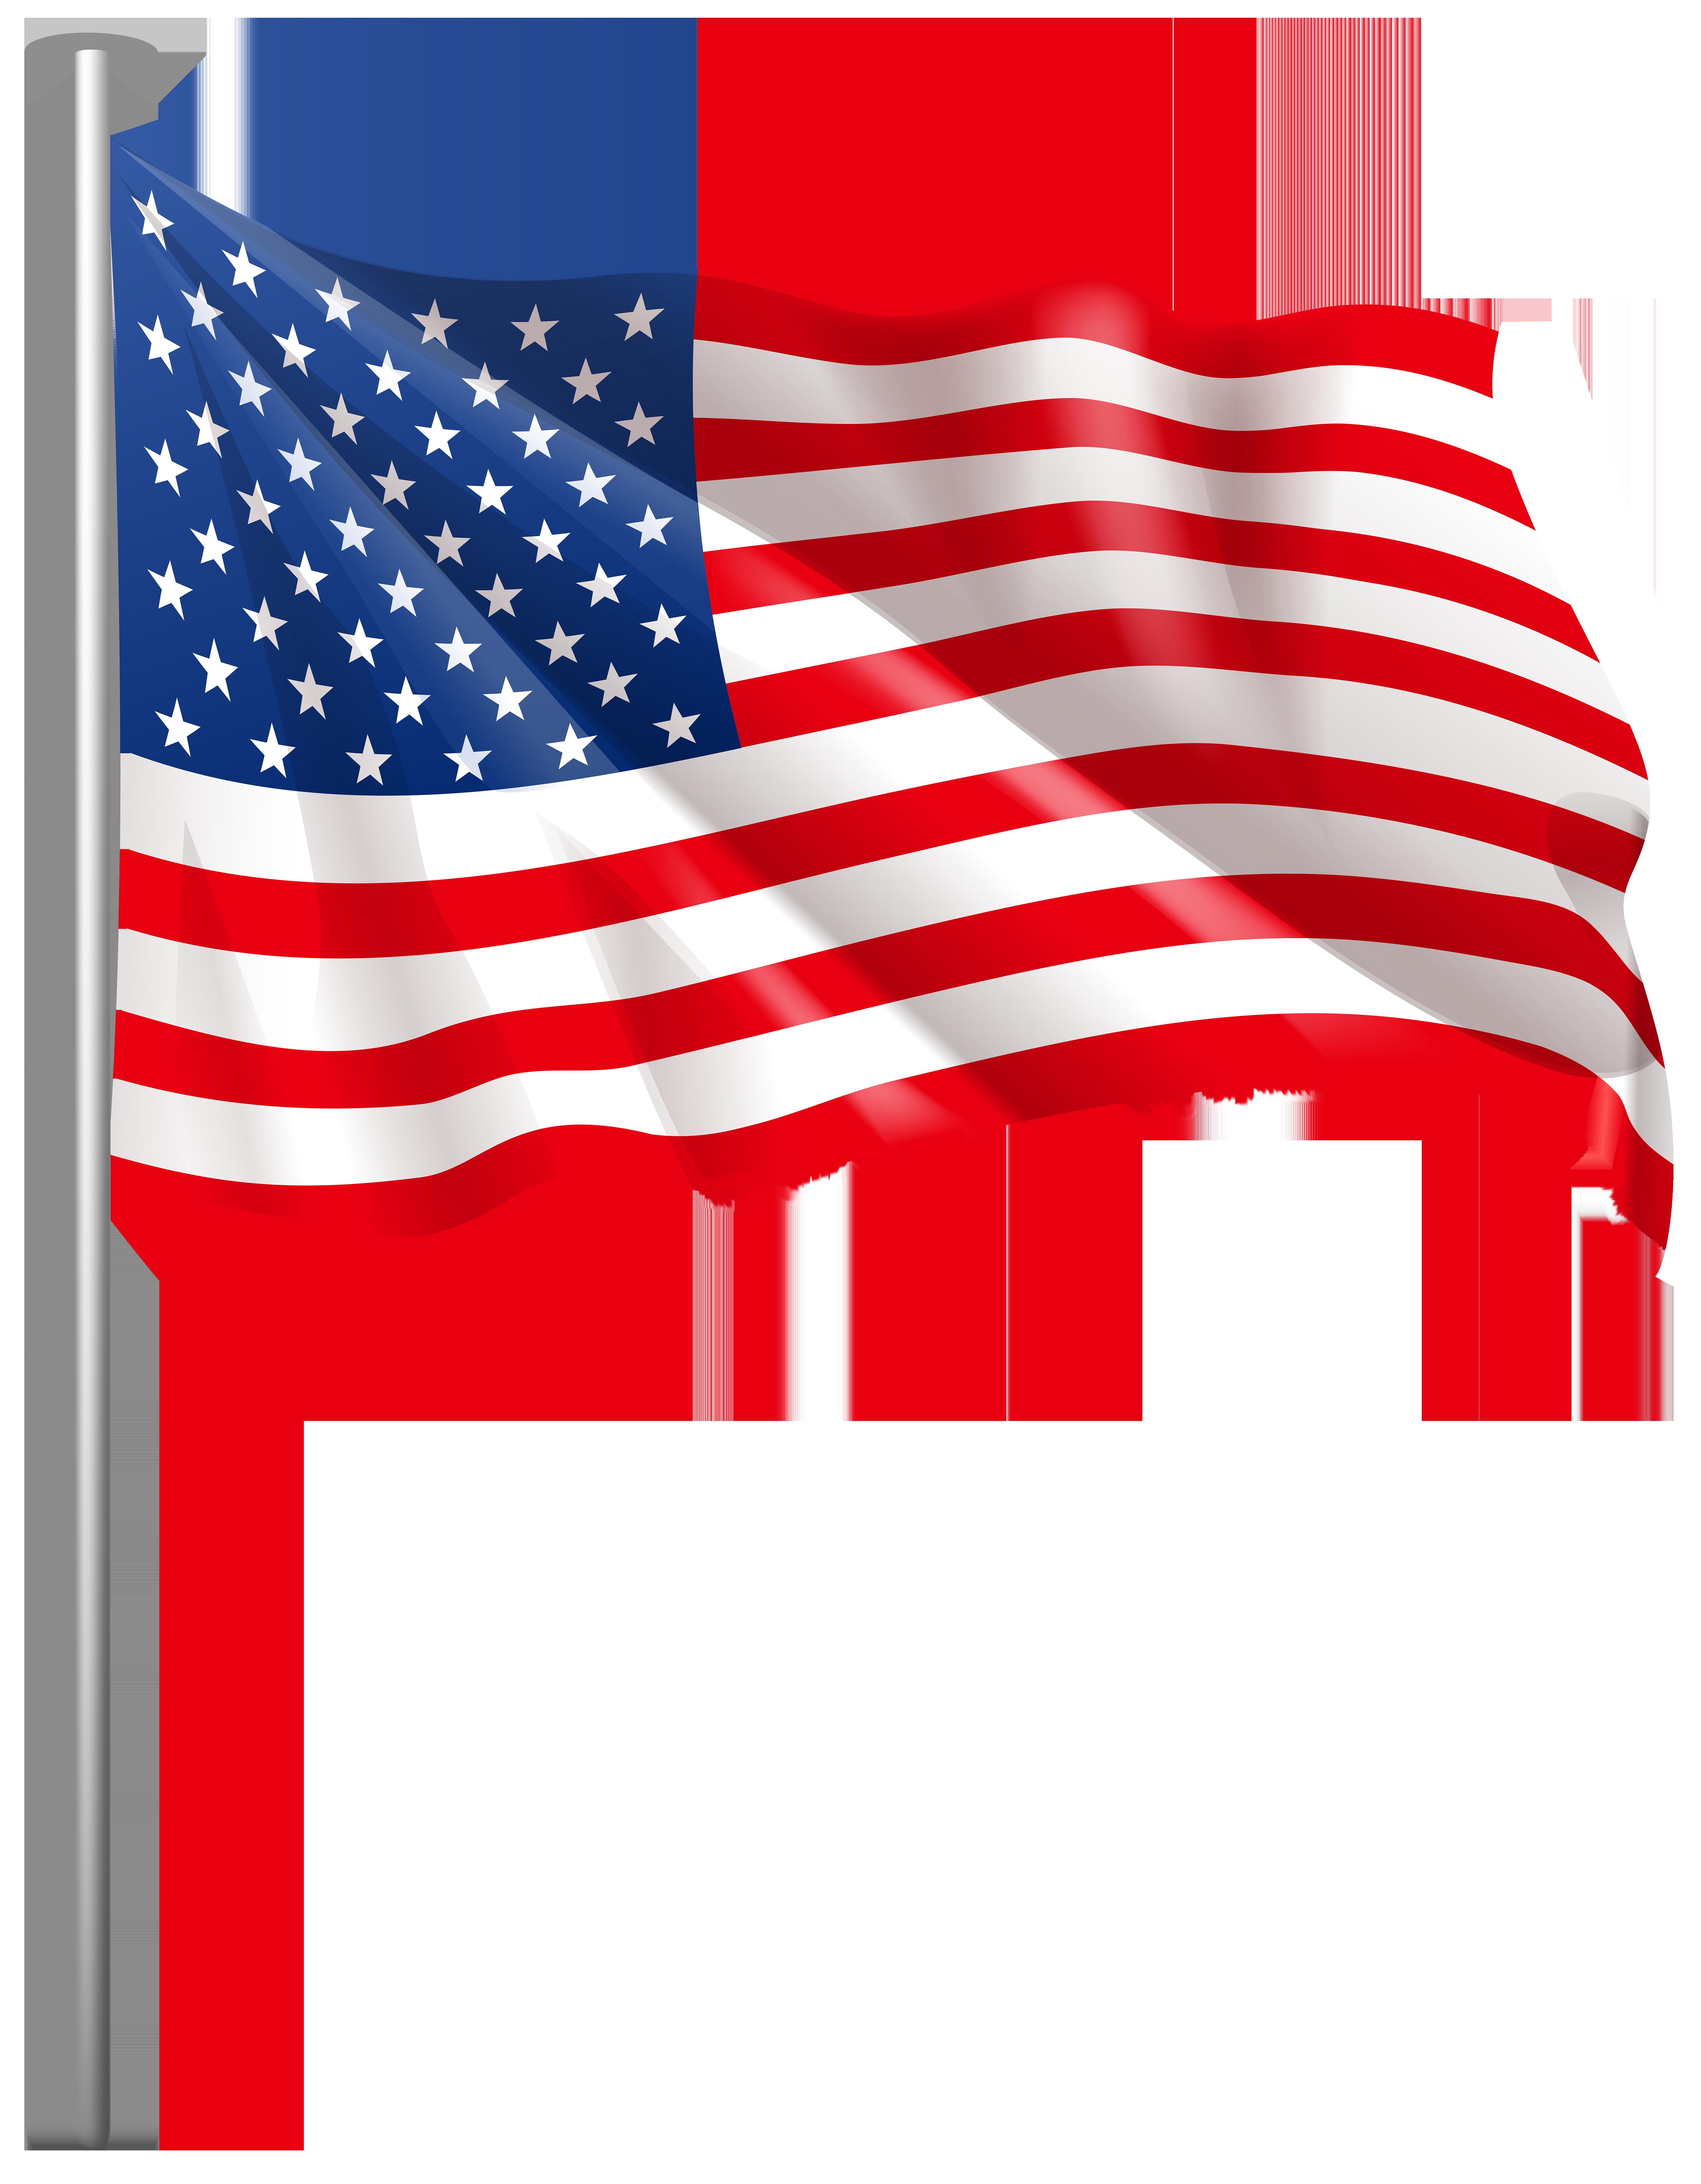 USA Waving Flag PNG Clip Art Image.